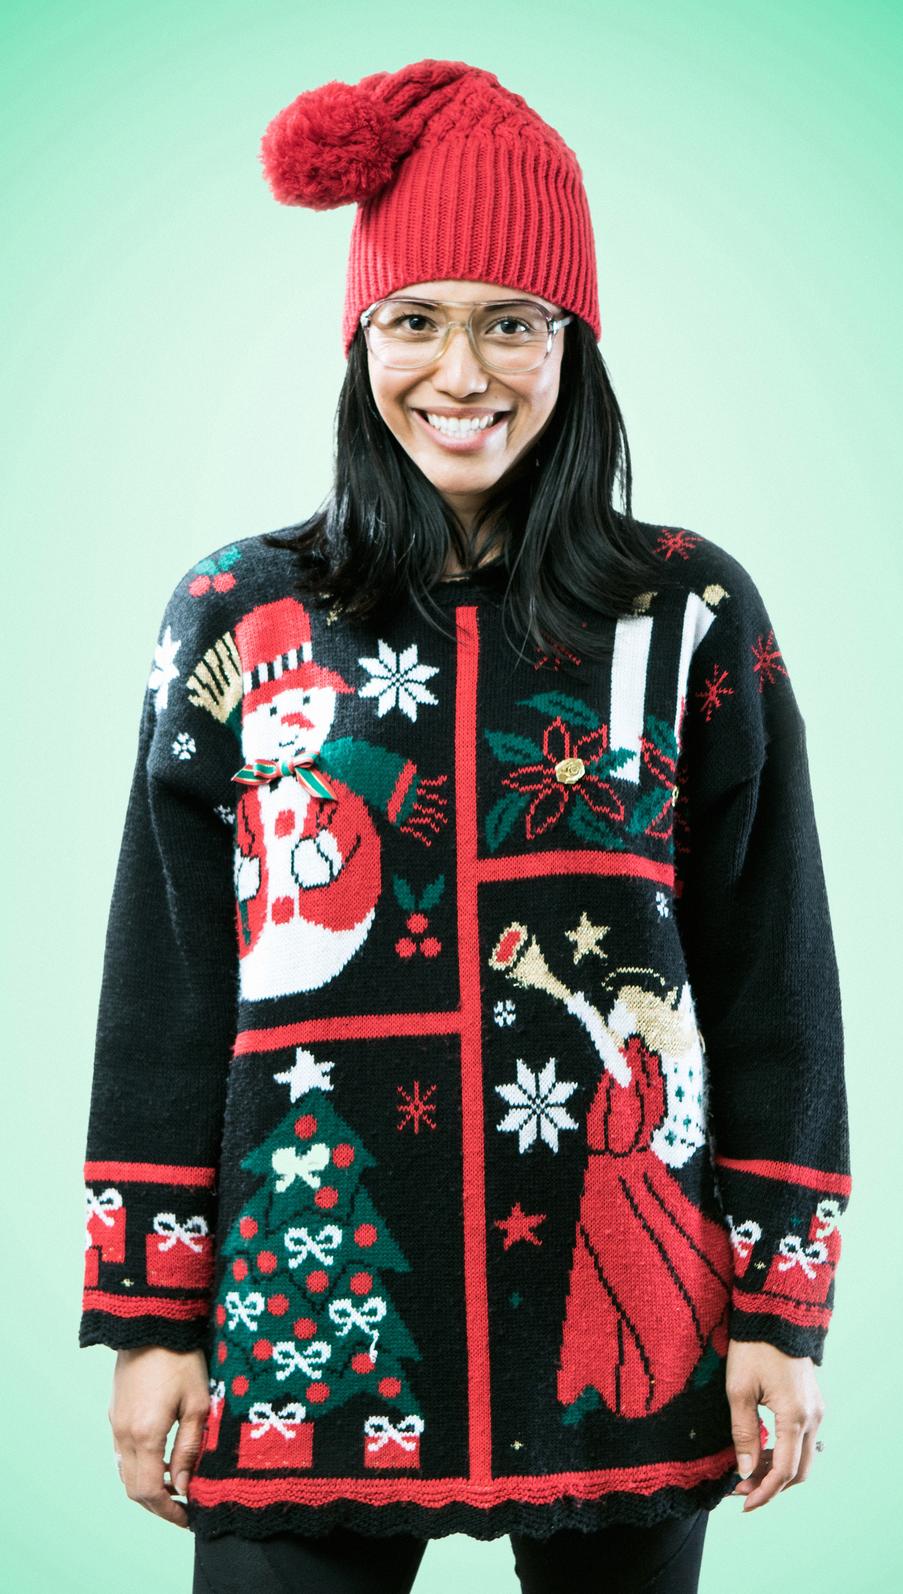 crazy_sweater.jpg